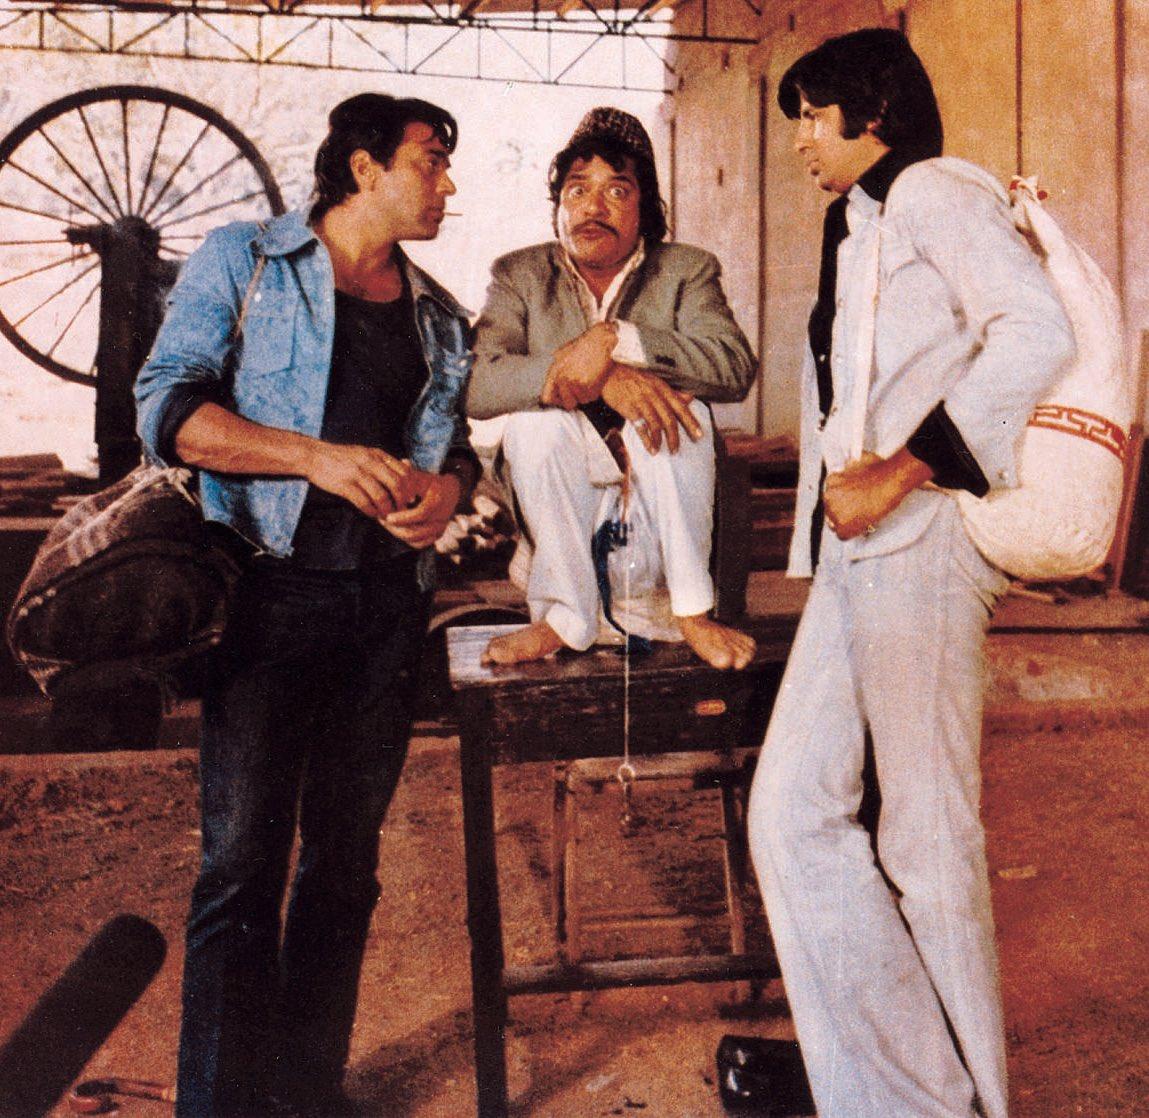 bollywood-ke-kisse-comedian-syed-ishtiaq-ahmed-jafri-aka-jagdeep-birthday-know-about-sholay-soorma-bhopali-story